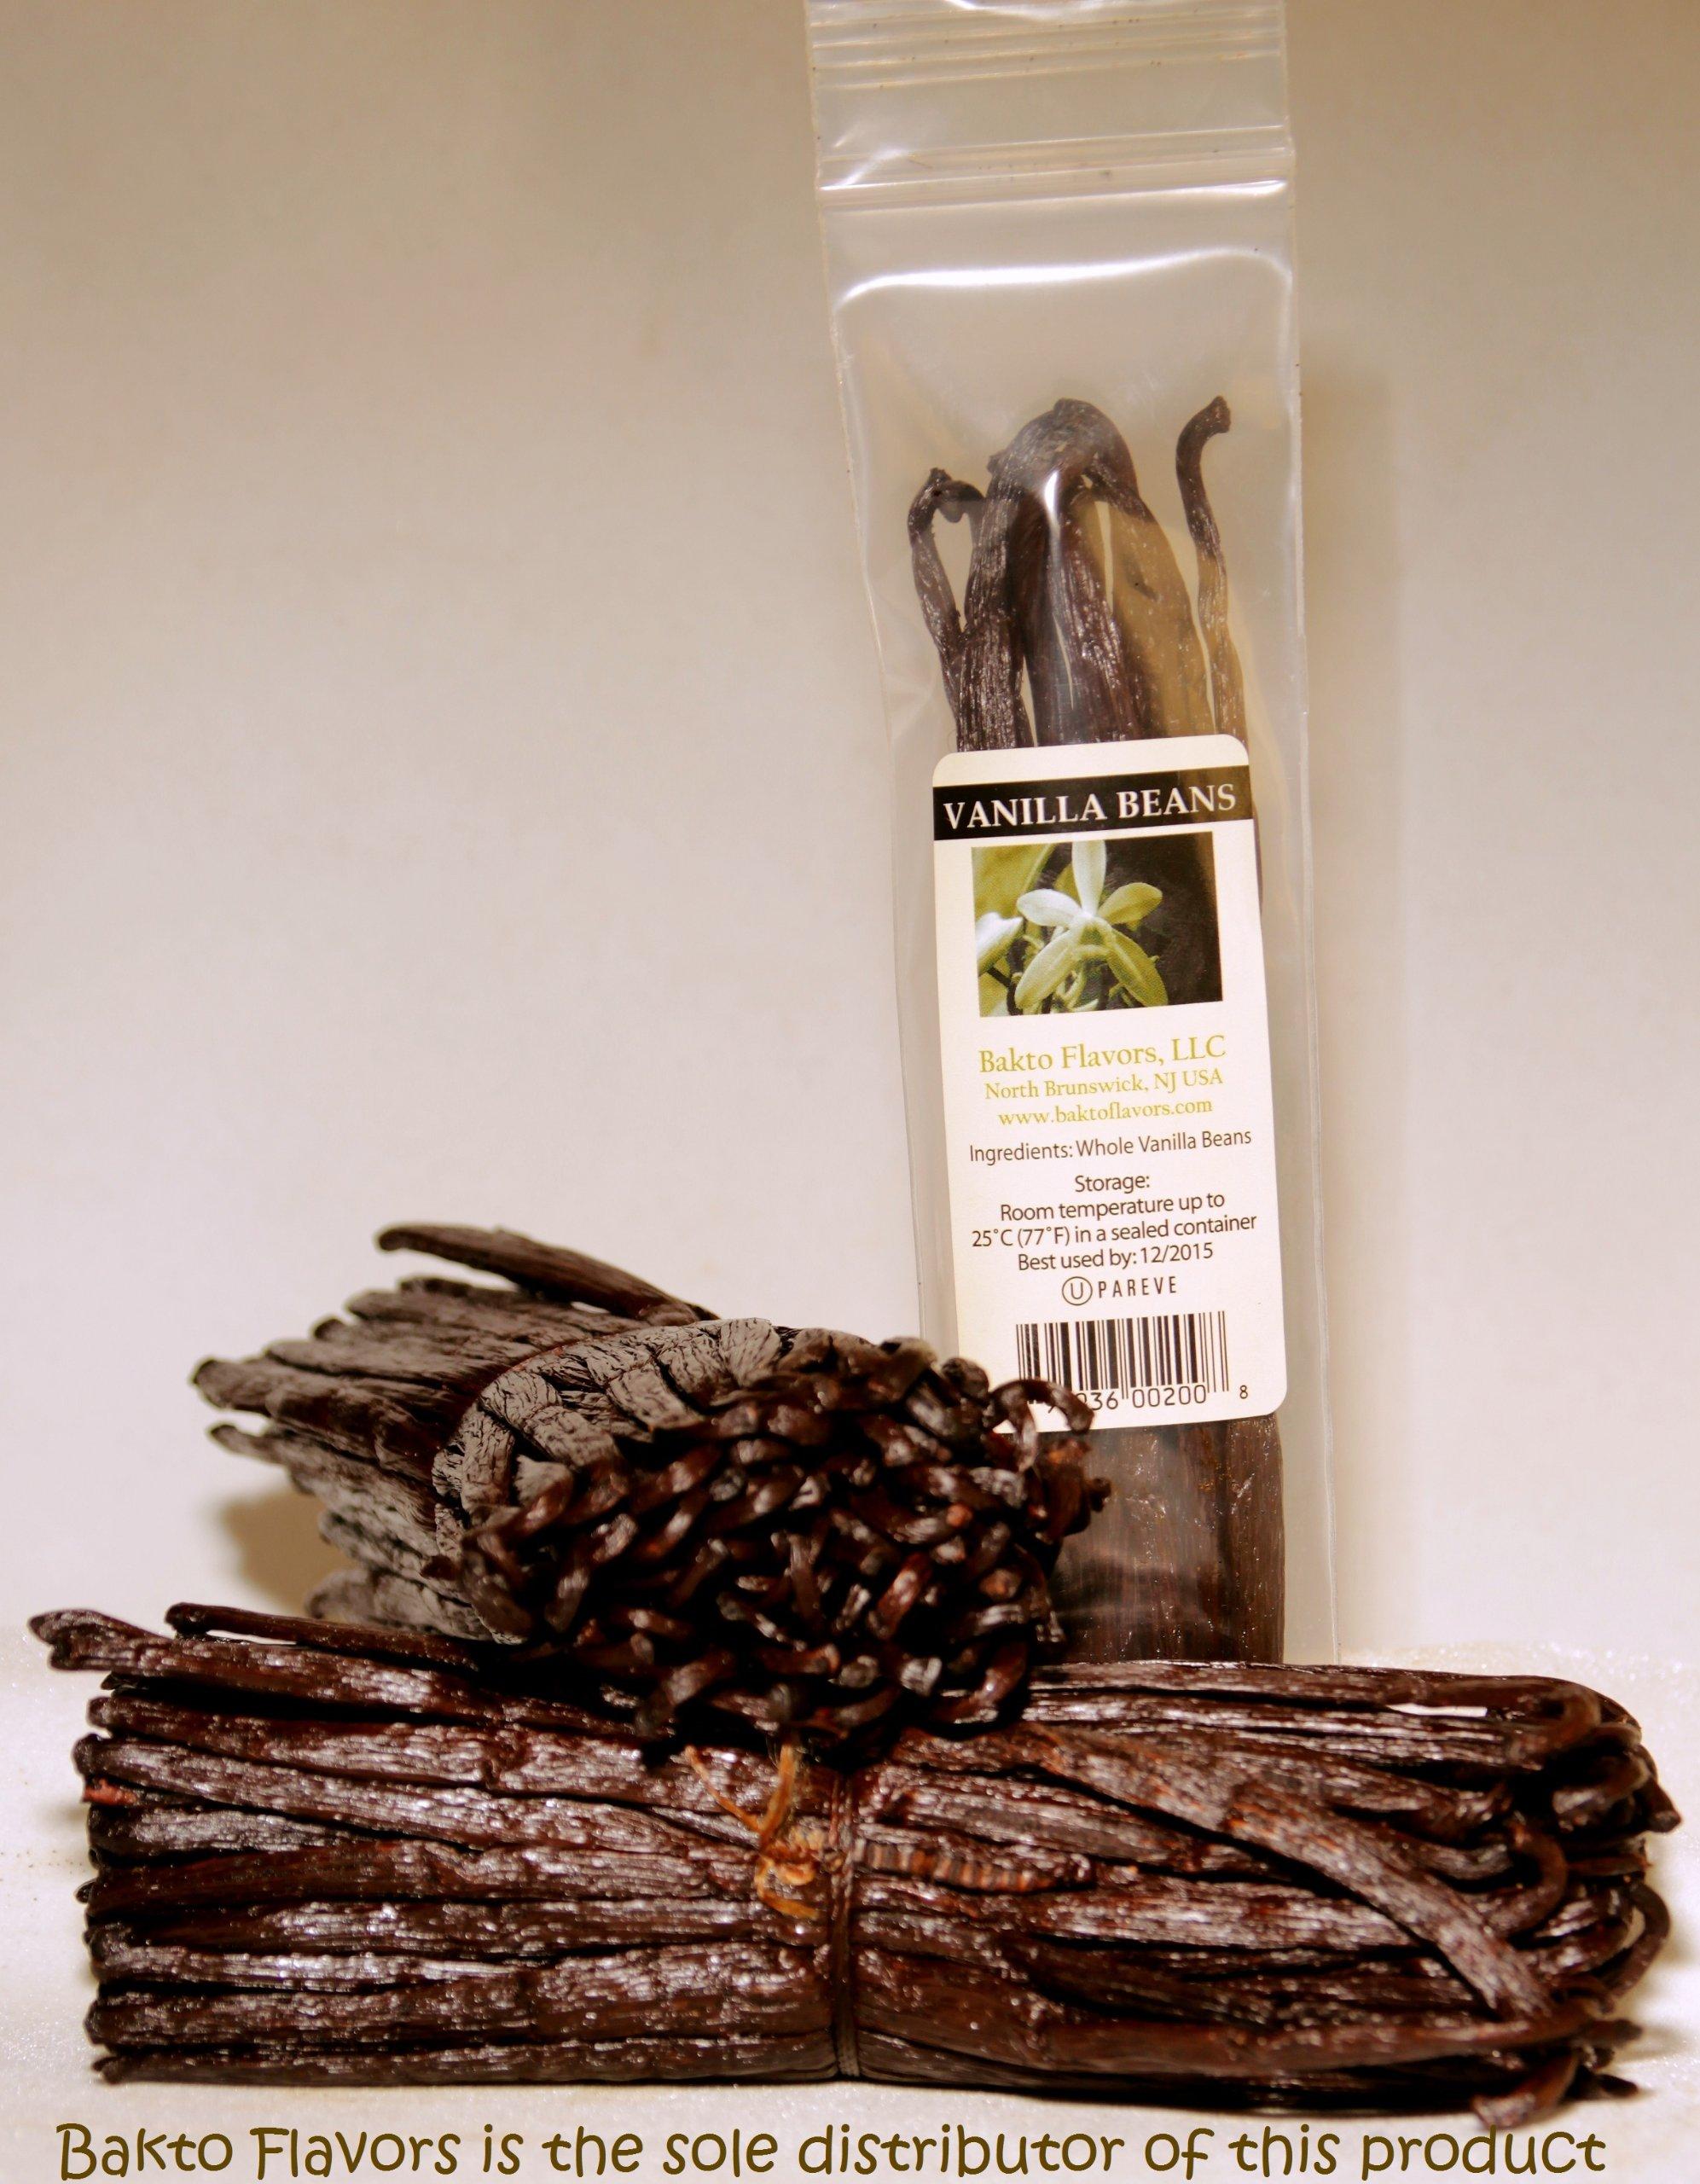 Bakto Flavors Vanilla Beans-Madagascar Gourmet-10 beans-Safest Products on the Market